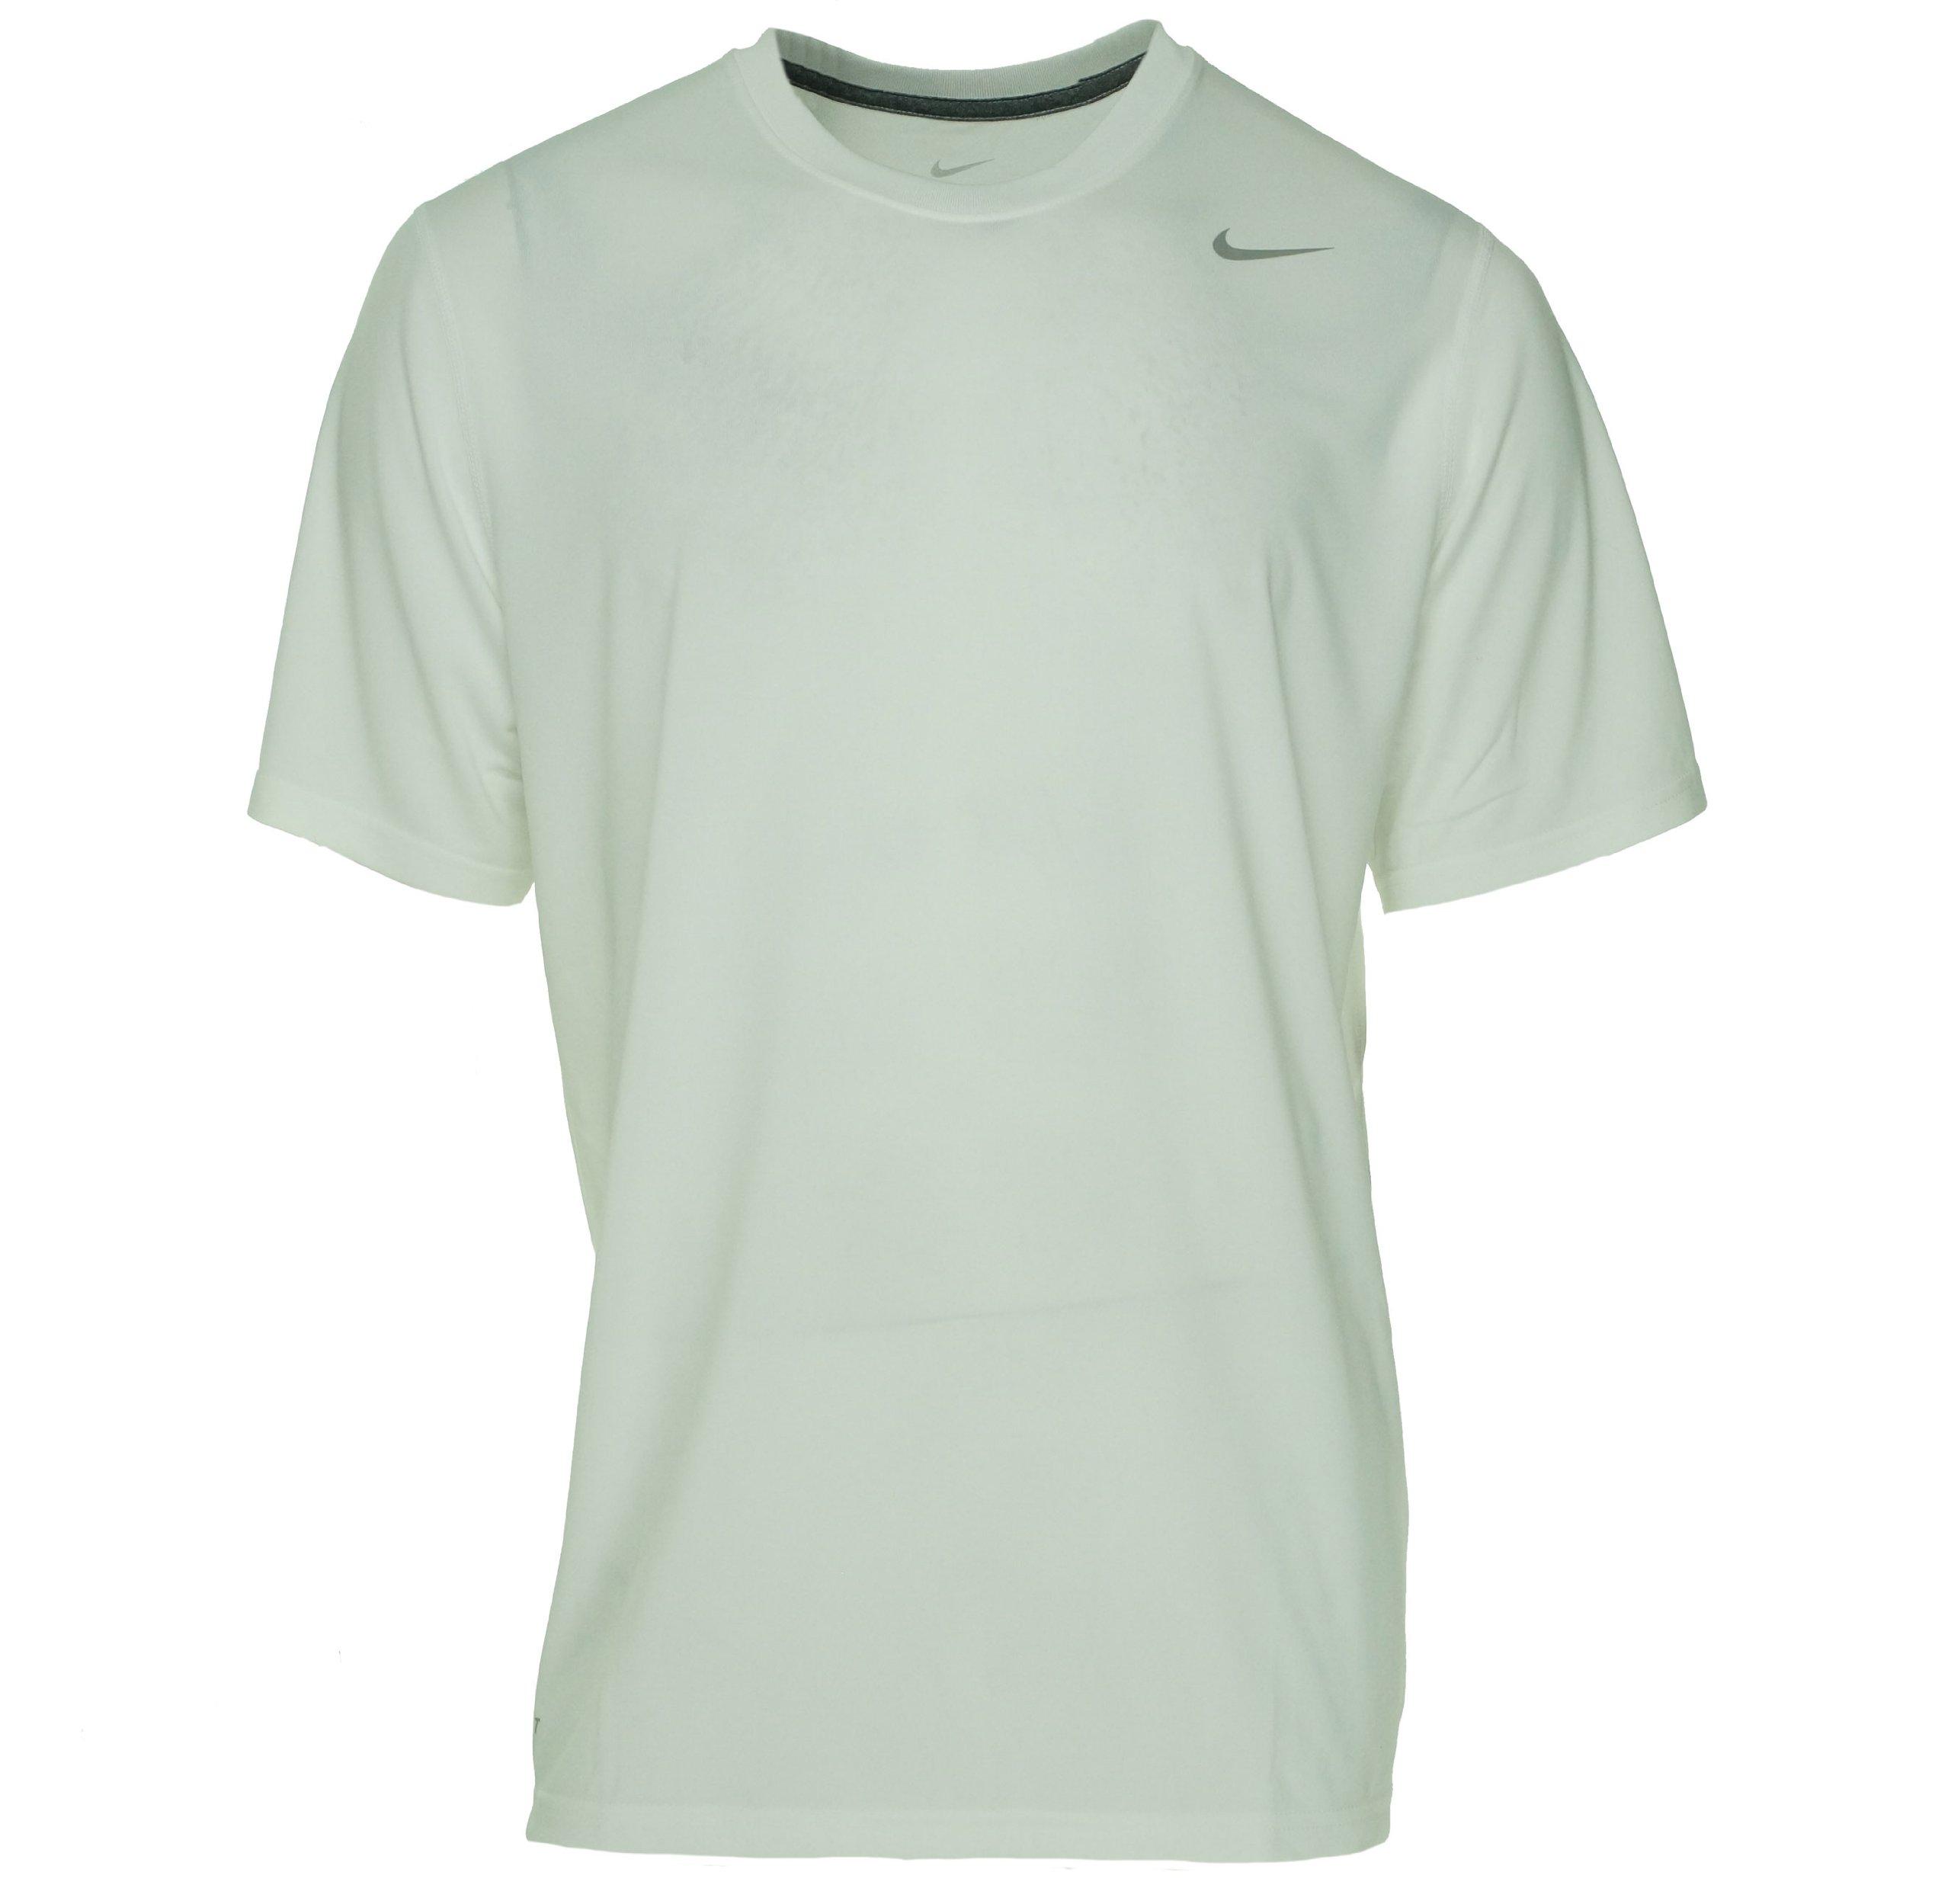 7137554e1 Men's Nike Tailwind Stripe Dri-Fit Touch Running Shirt 799137 011 Size  Medium. $24.99. Nike Legend White Short Sleeve Performance Shirt, XL